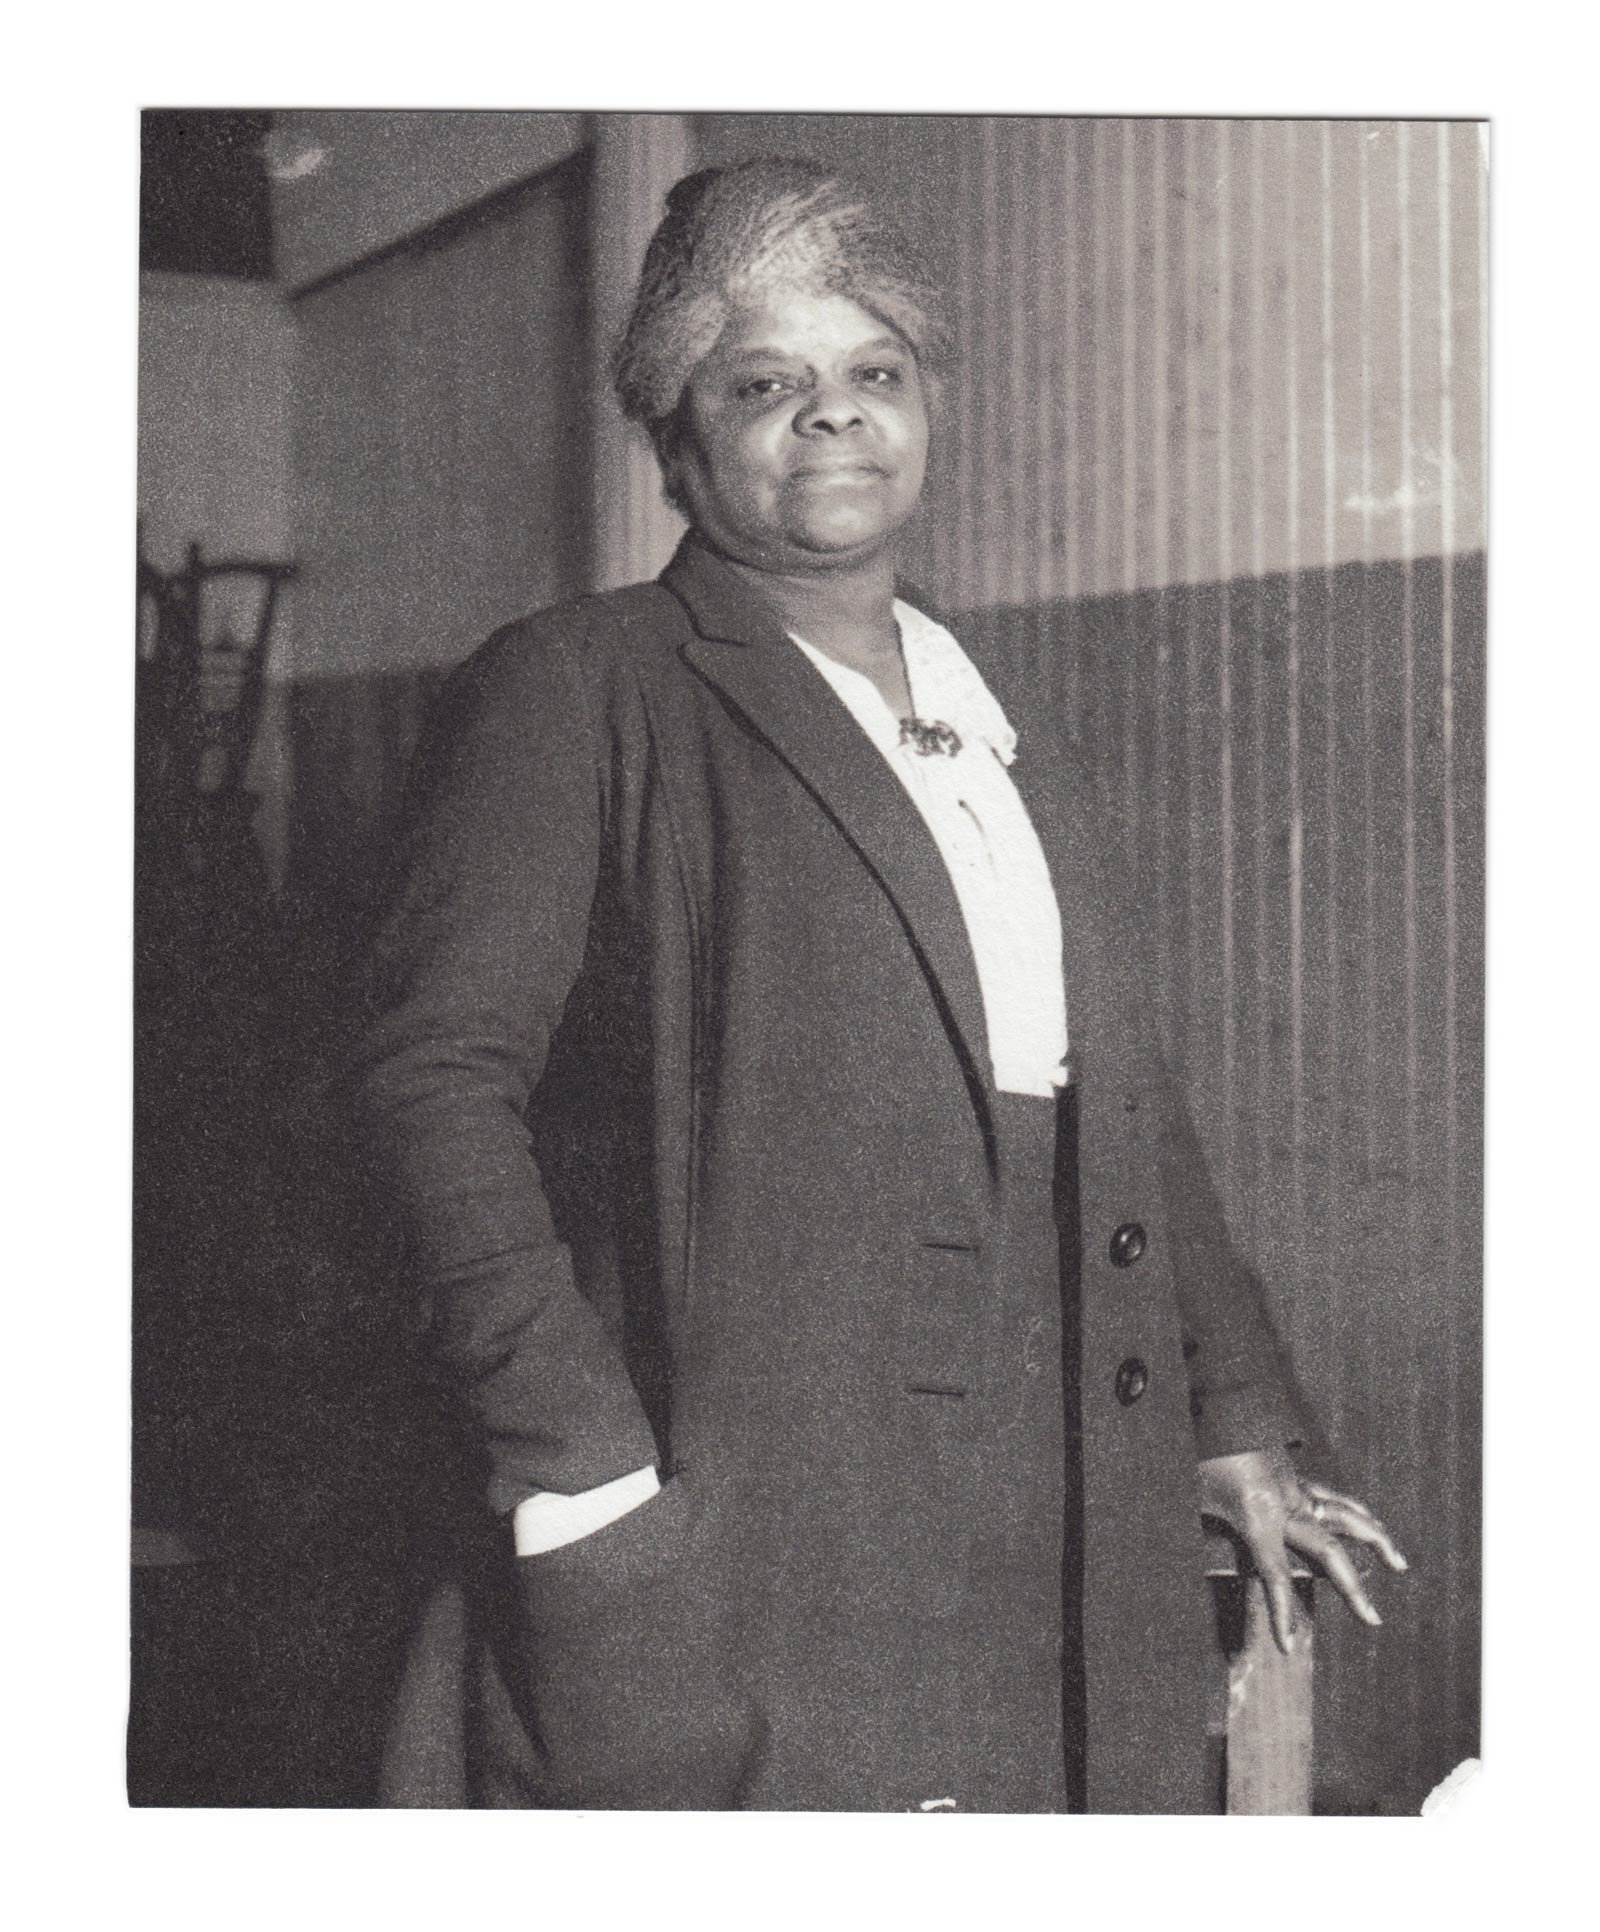 Phyllis R. Klotman, Katie Cannon, Ida B. Wells, African American Vote, Black Vote, African American Politics, Black Politics, The FIVE FIFTHS, TheFIVEFIFTHS, KOLUMN Magazine, KOLUMN, Willoughby Avenue